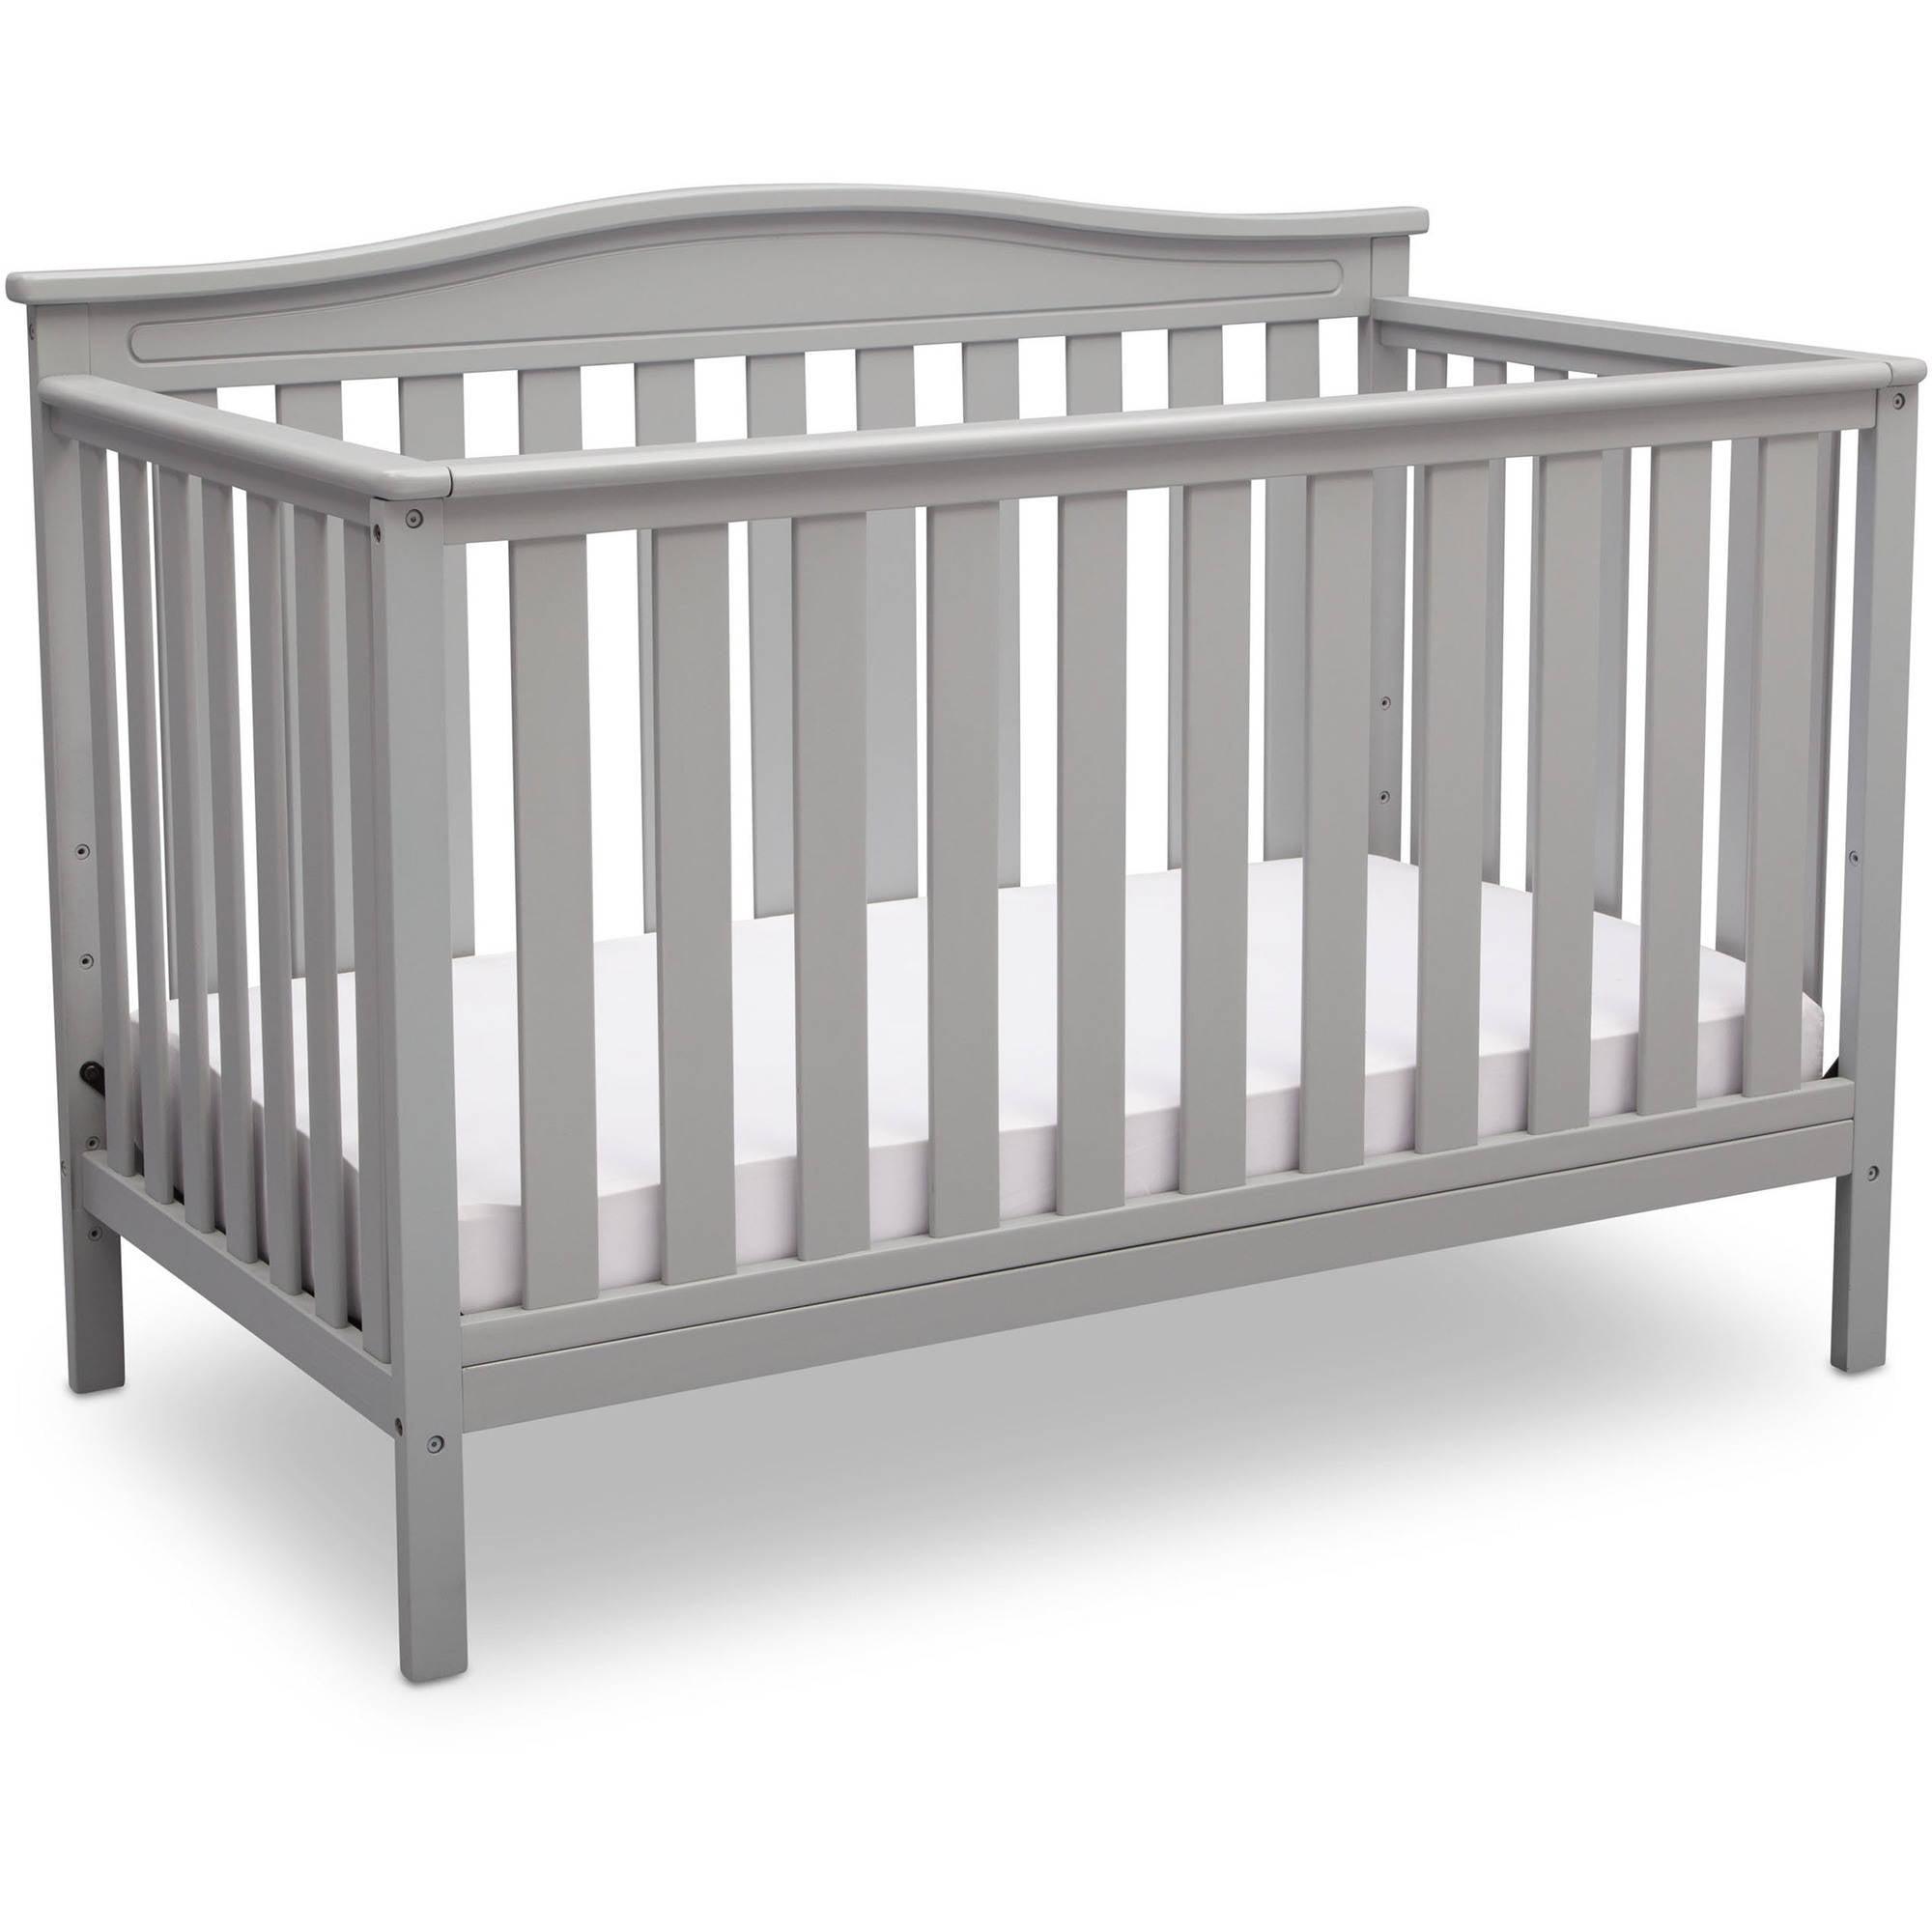 Delta Children Independence 4-in-1 Convertible Crib, Grey